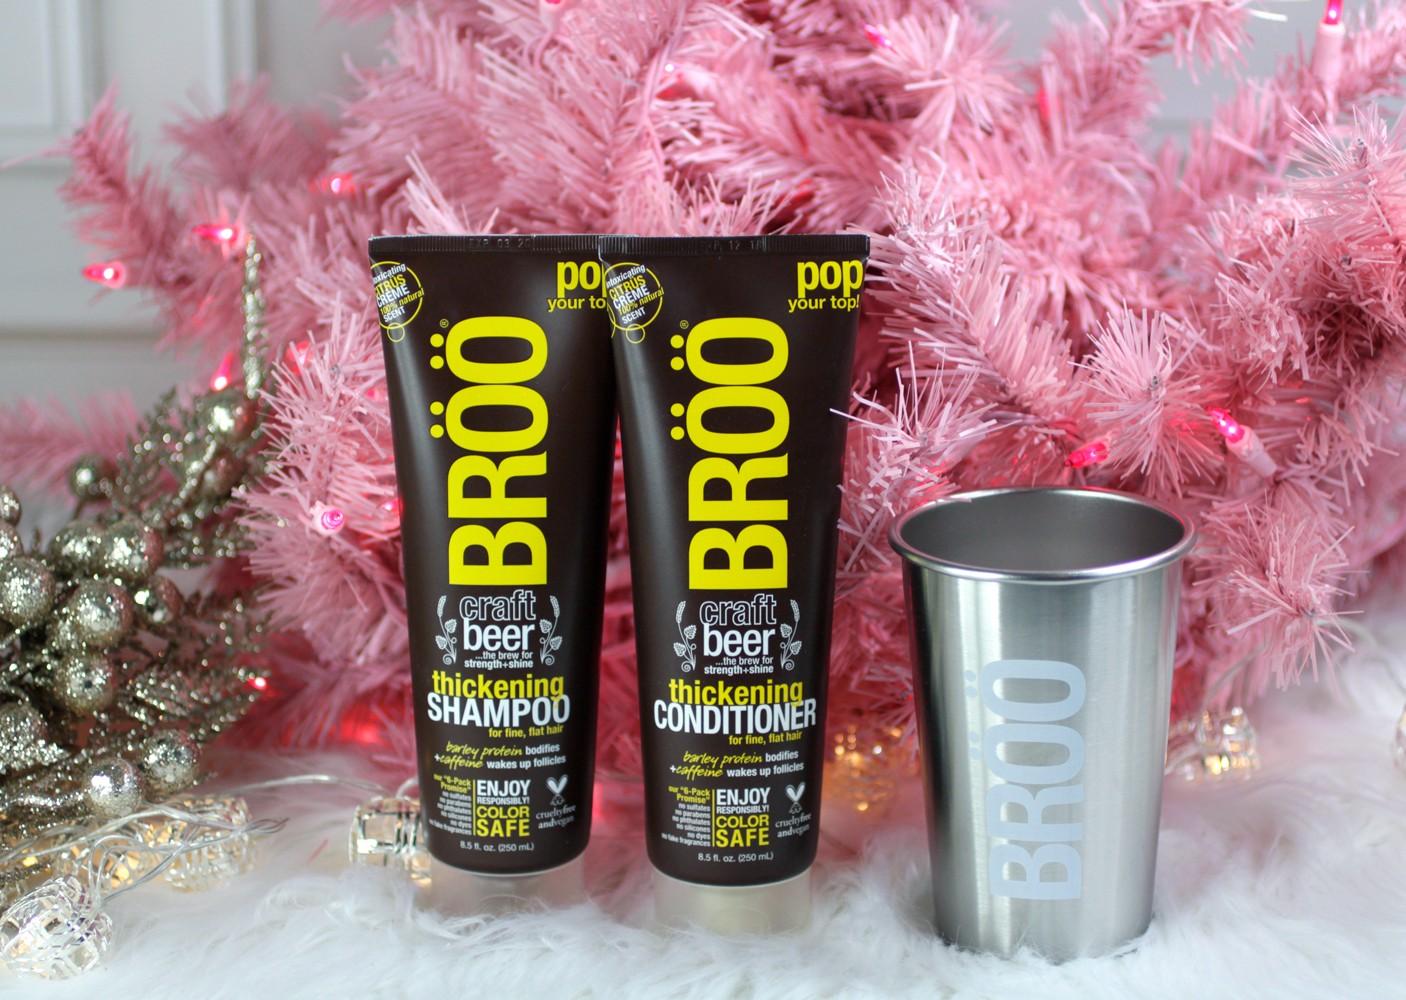 BROO Beer Shampoo Holiday Gift Set